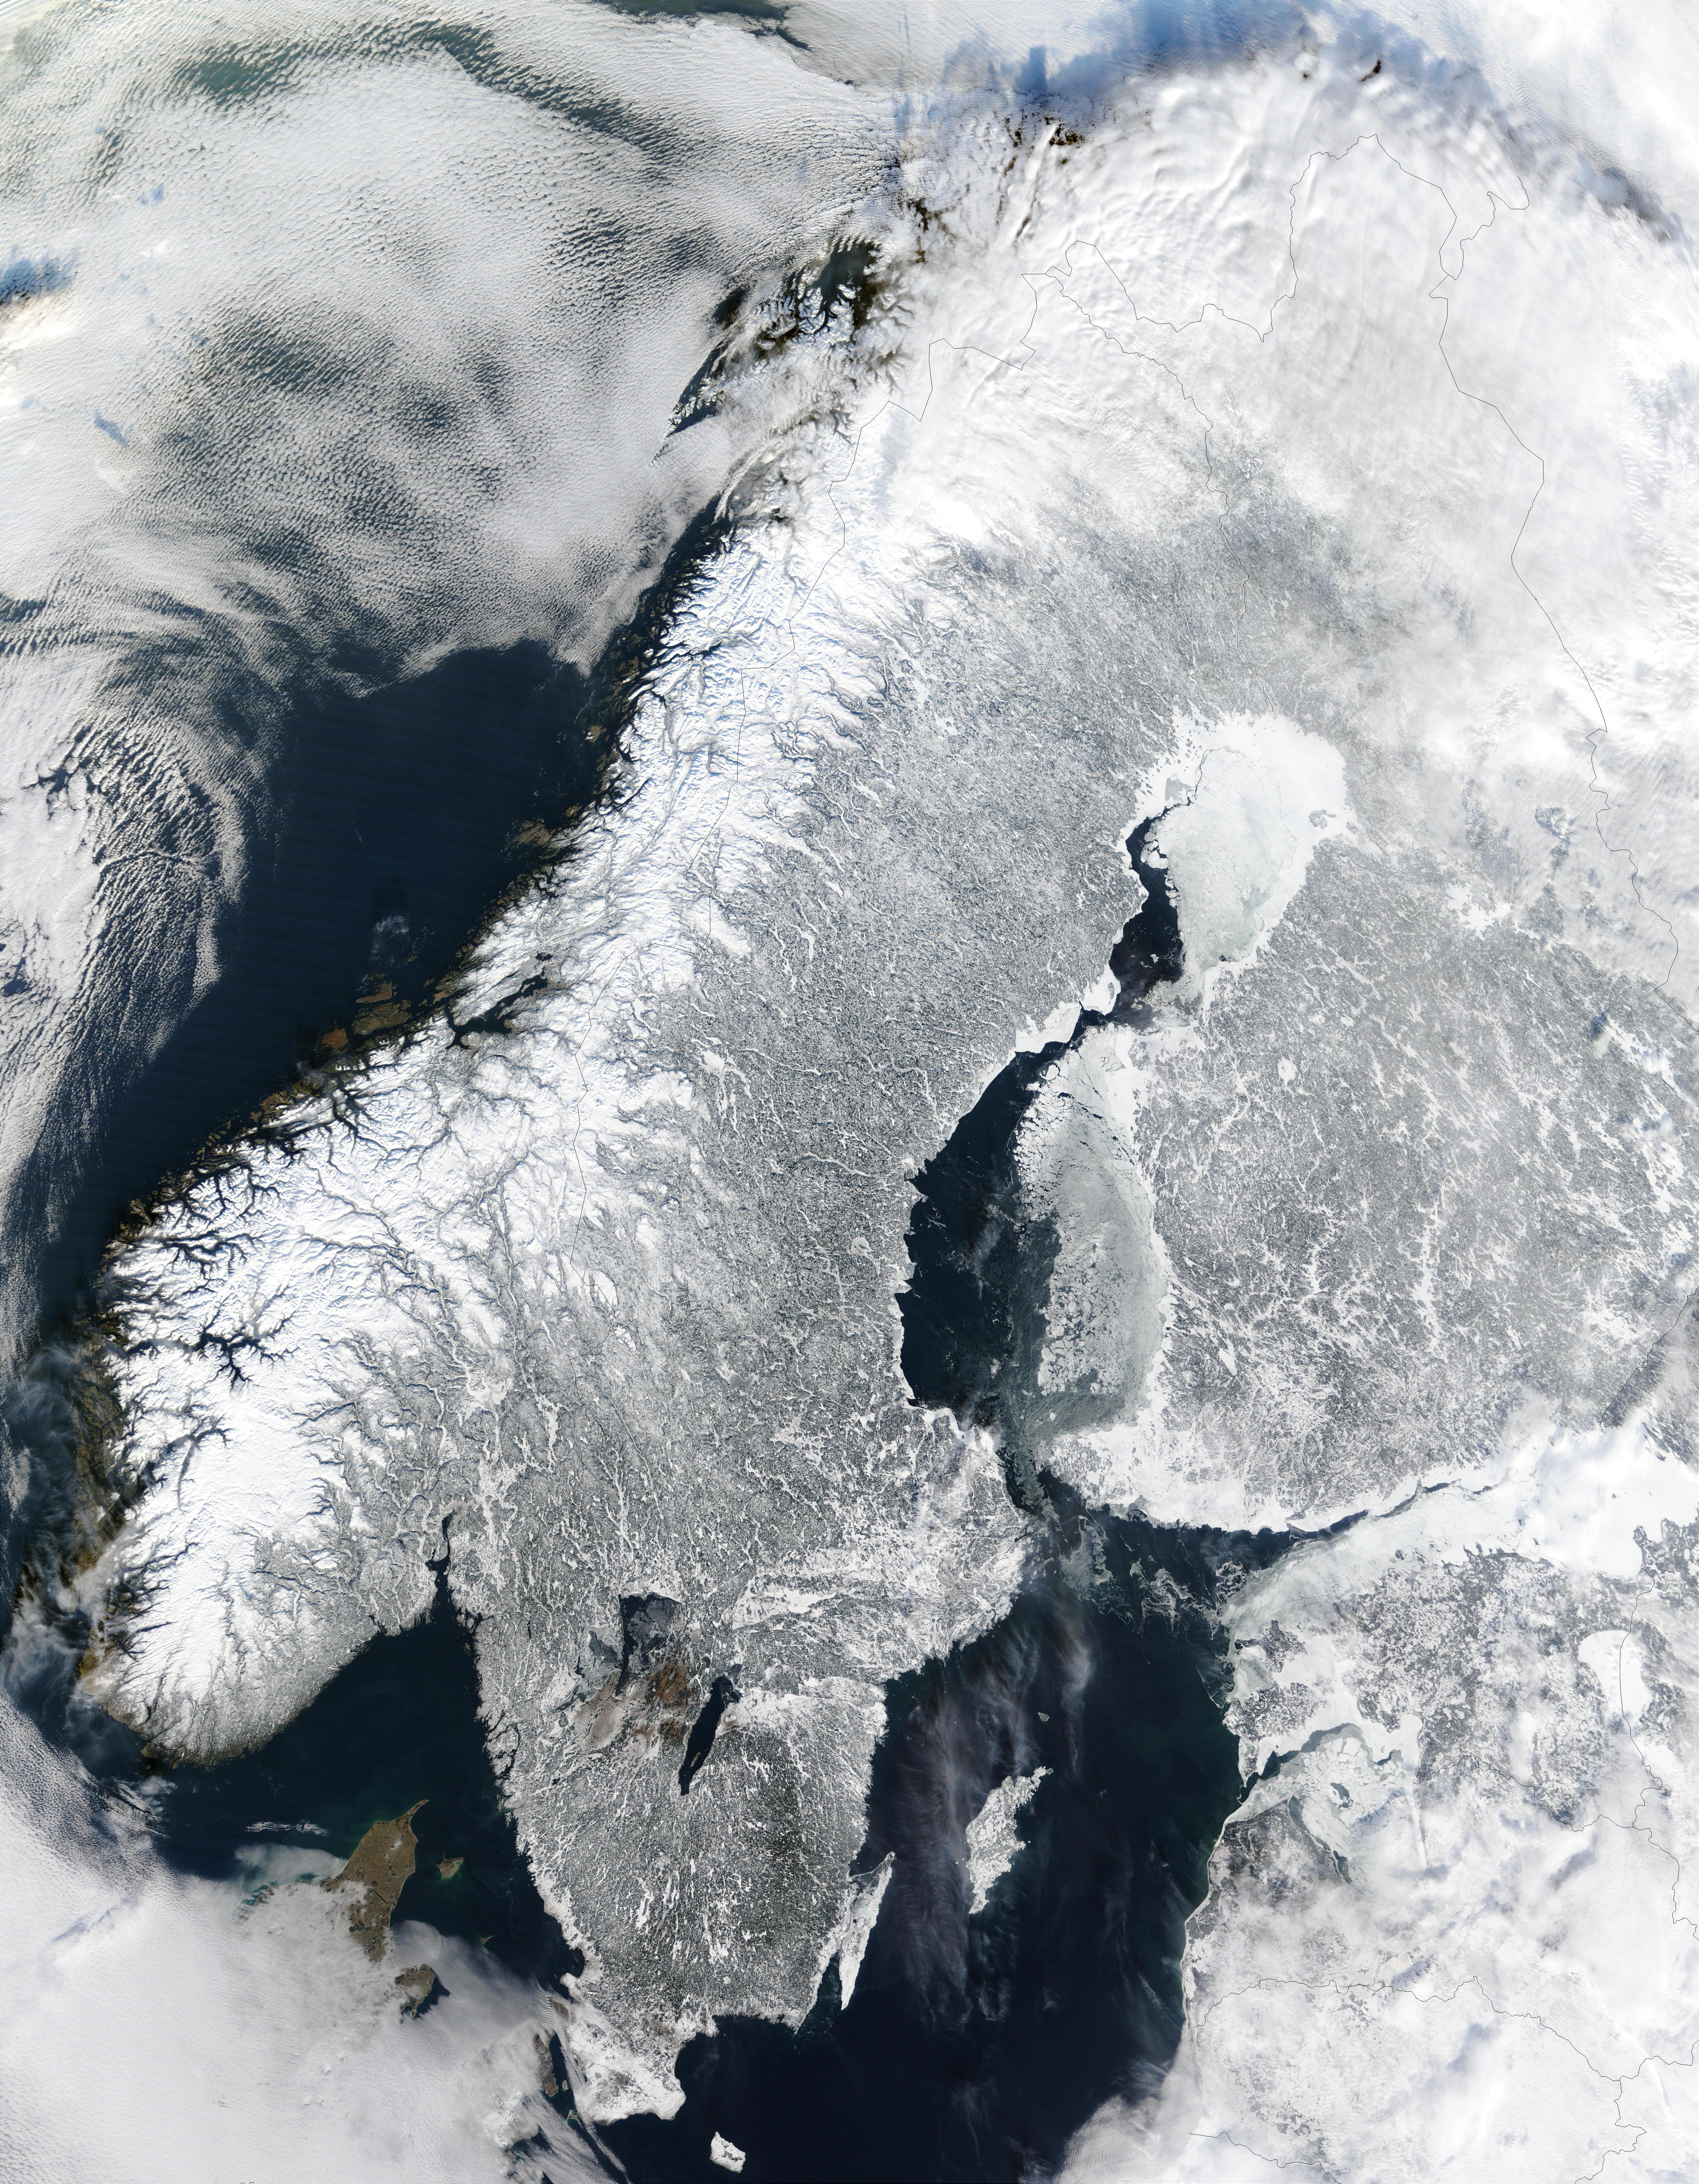 Scandinavia winter 2003